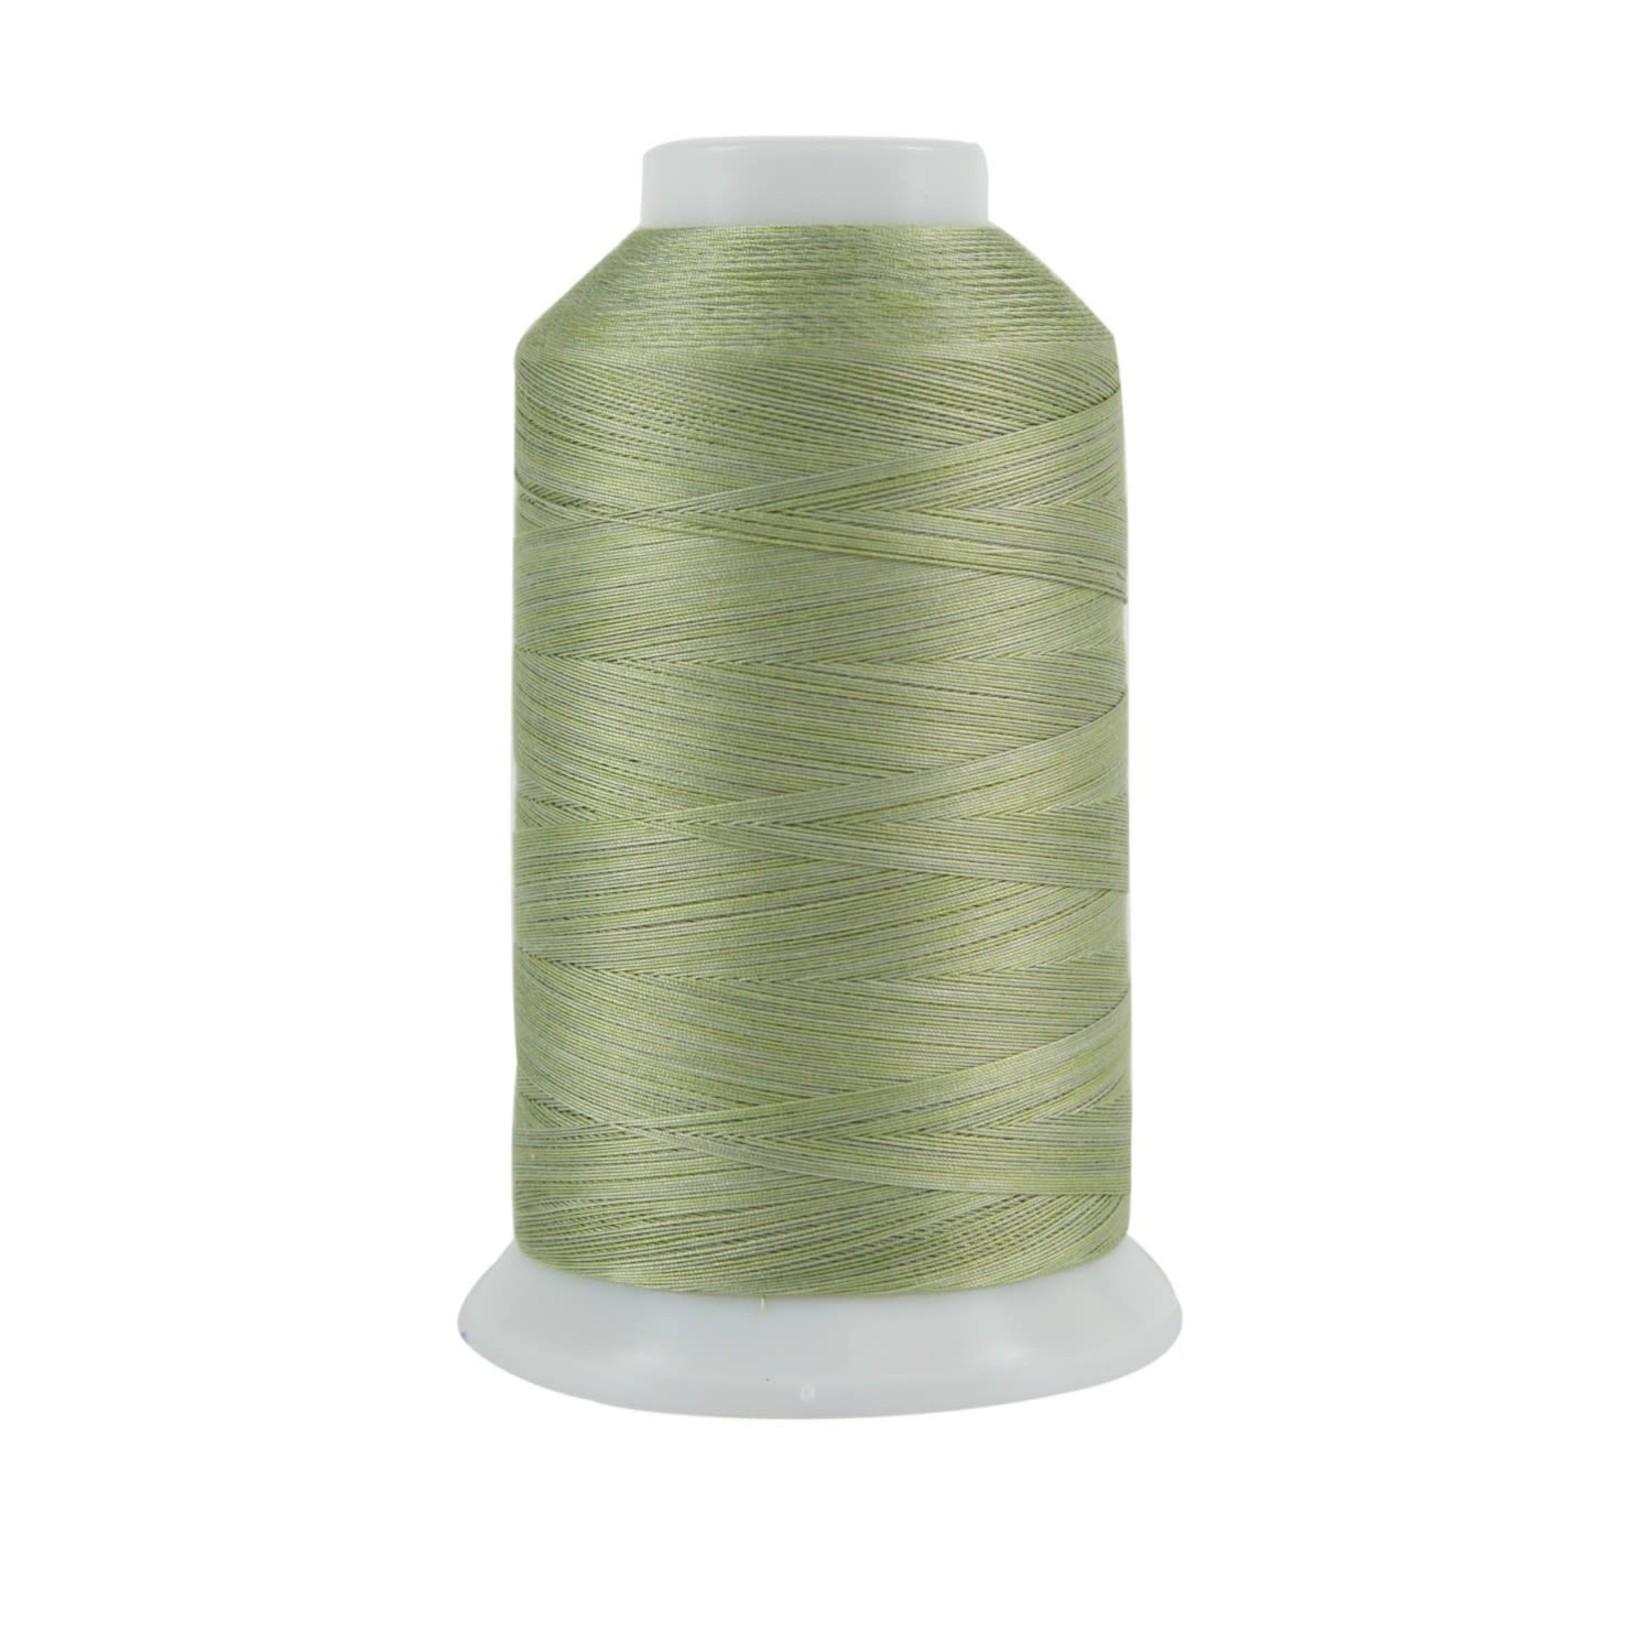 Superior Threads King Tut - #40 - 1828 m - 0975 Reed